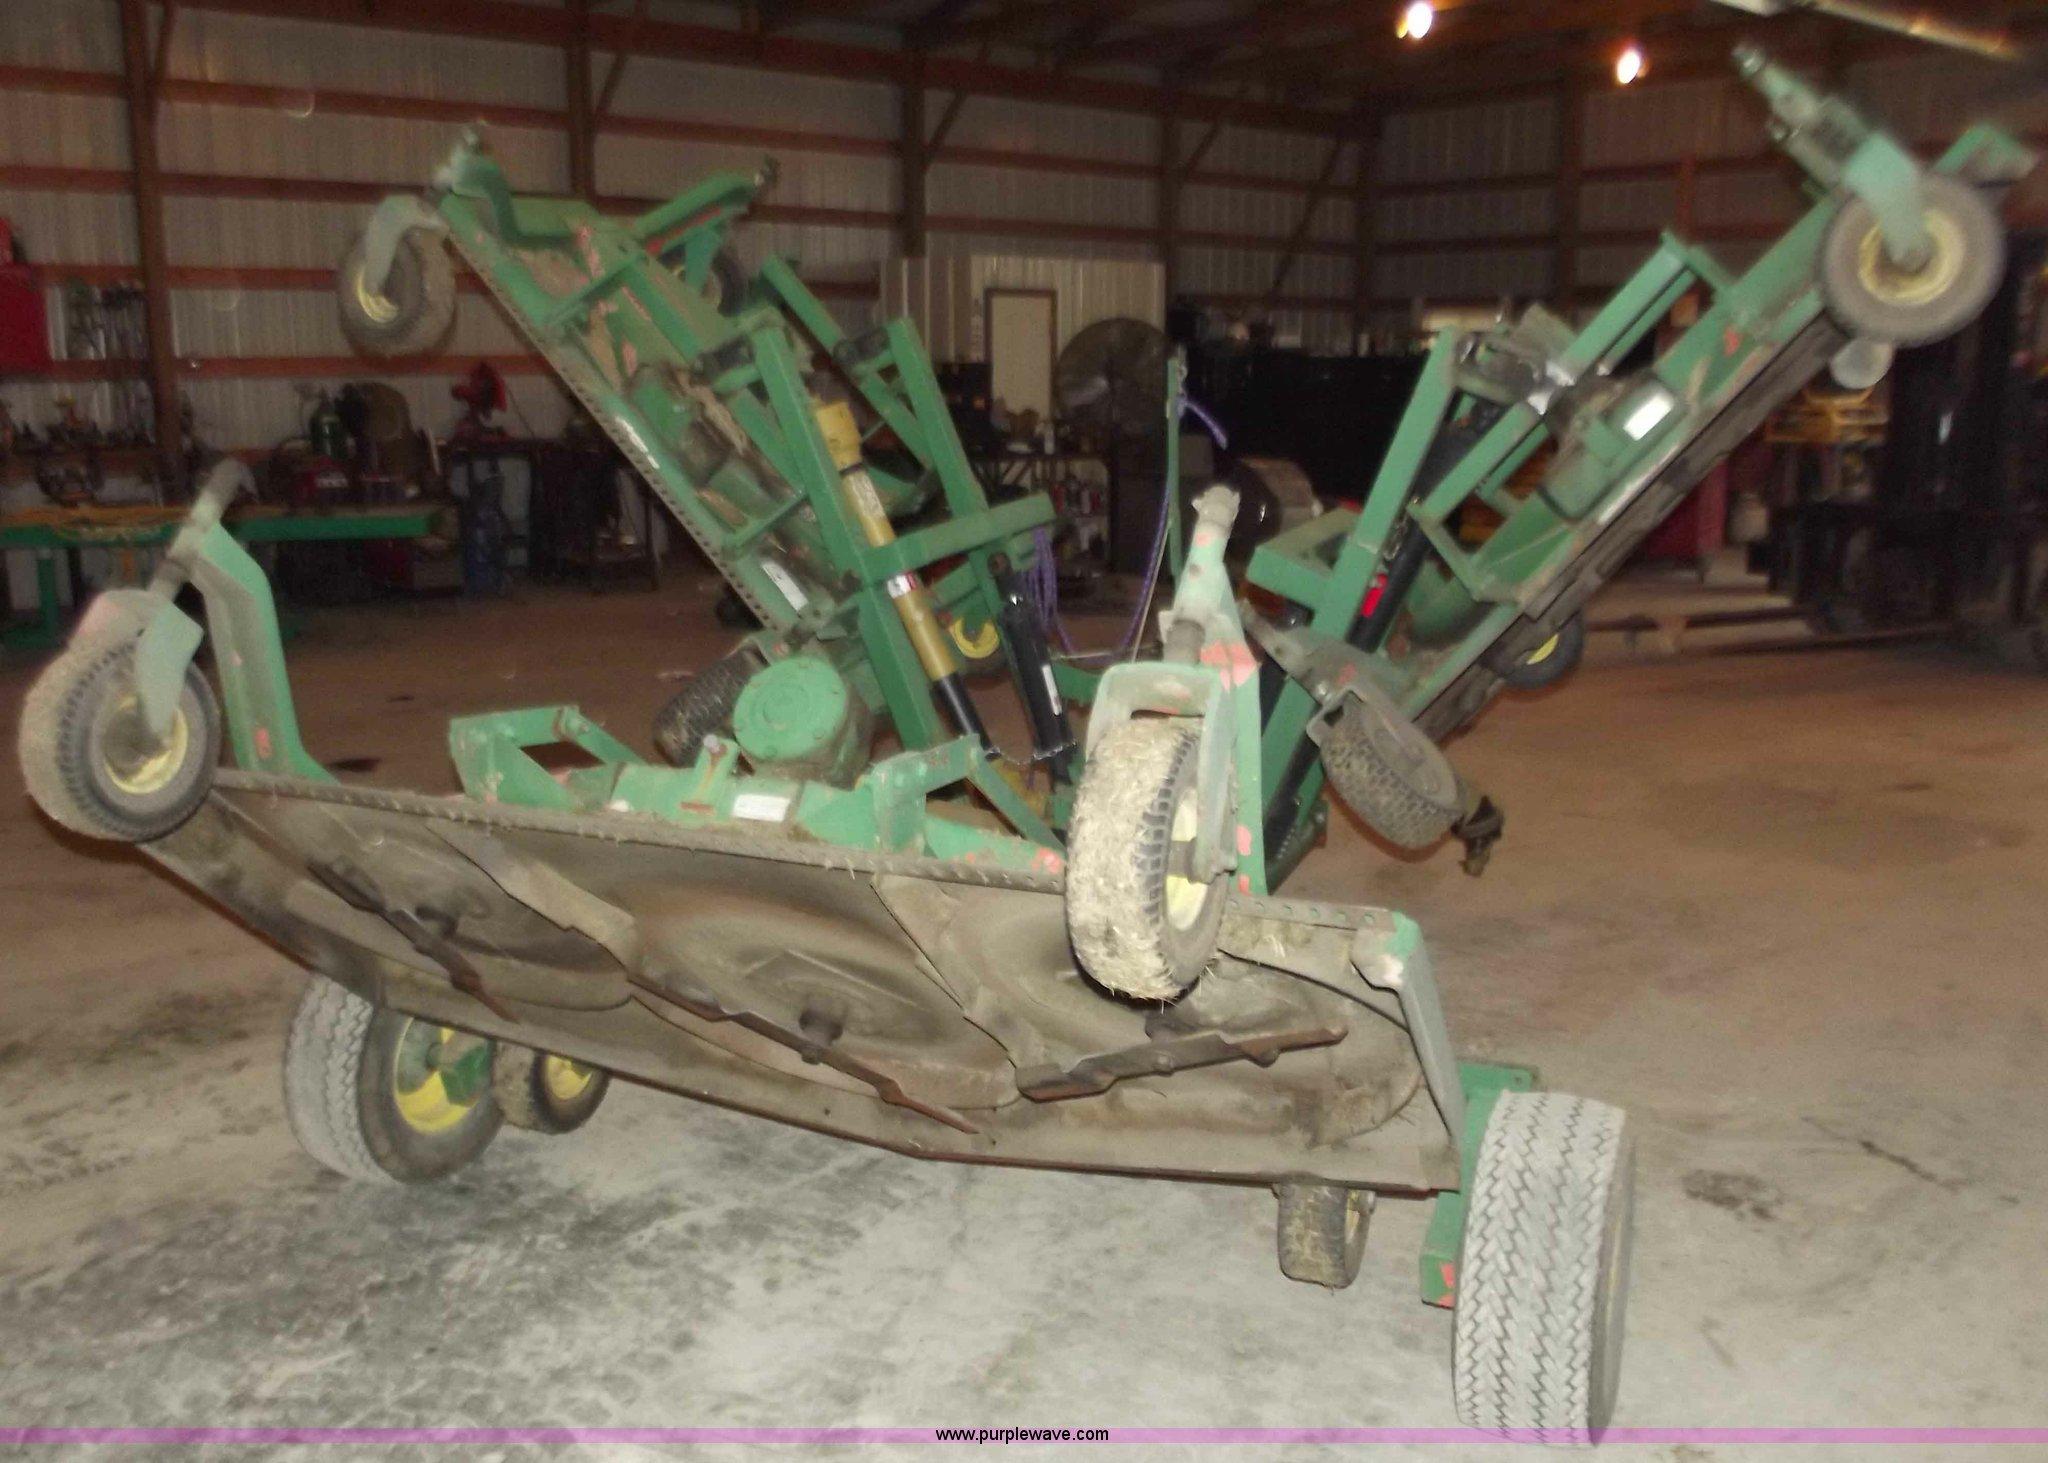 Befco Cyclone Flex 15' commercial finish mower   Item B6209